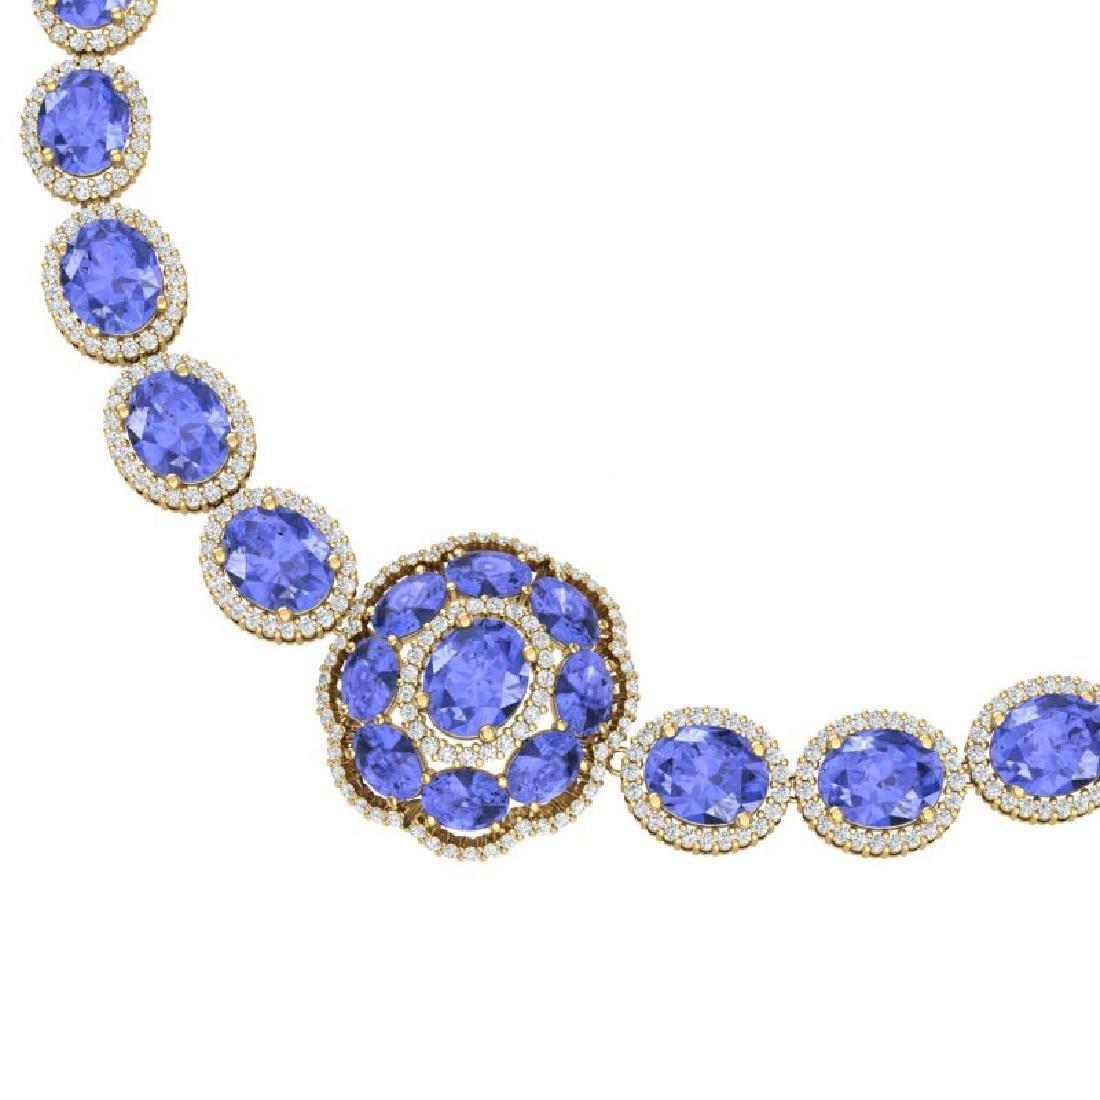 55.84 CTW Royalty Tanzanite & VS Diamond Necklace 18K